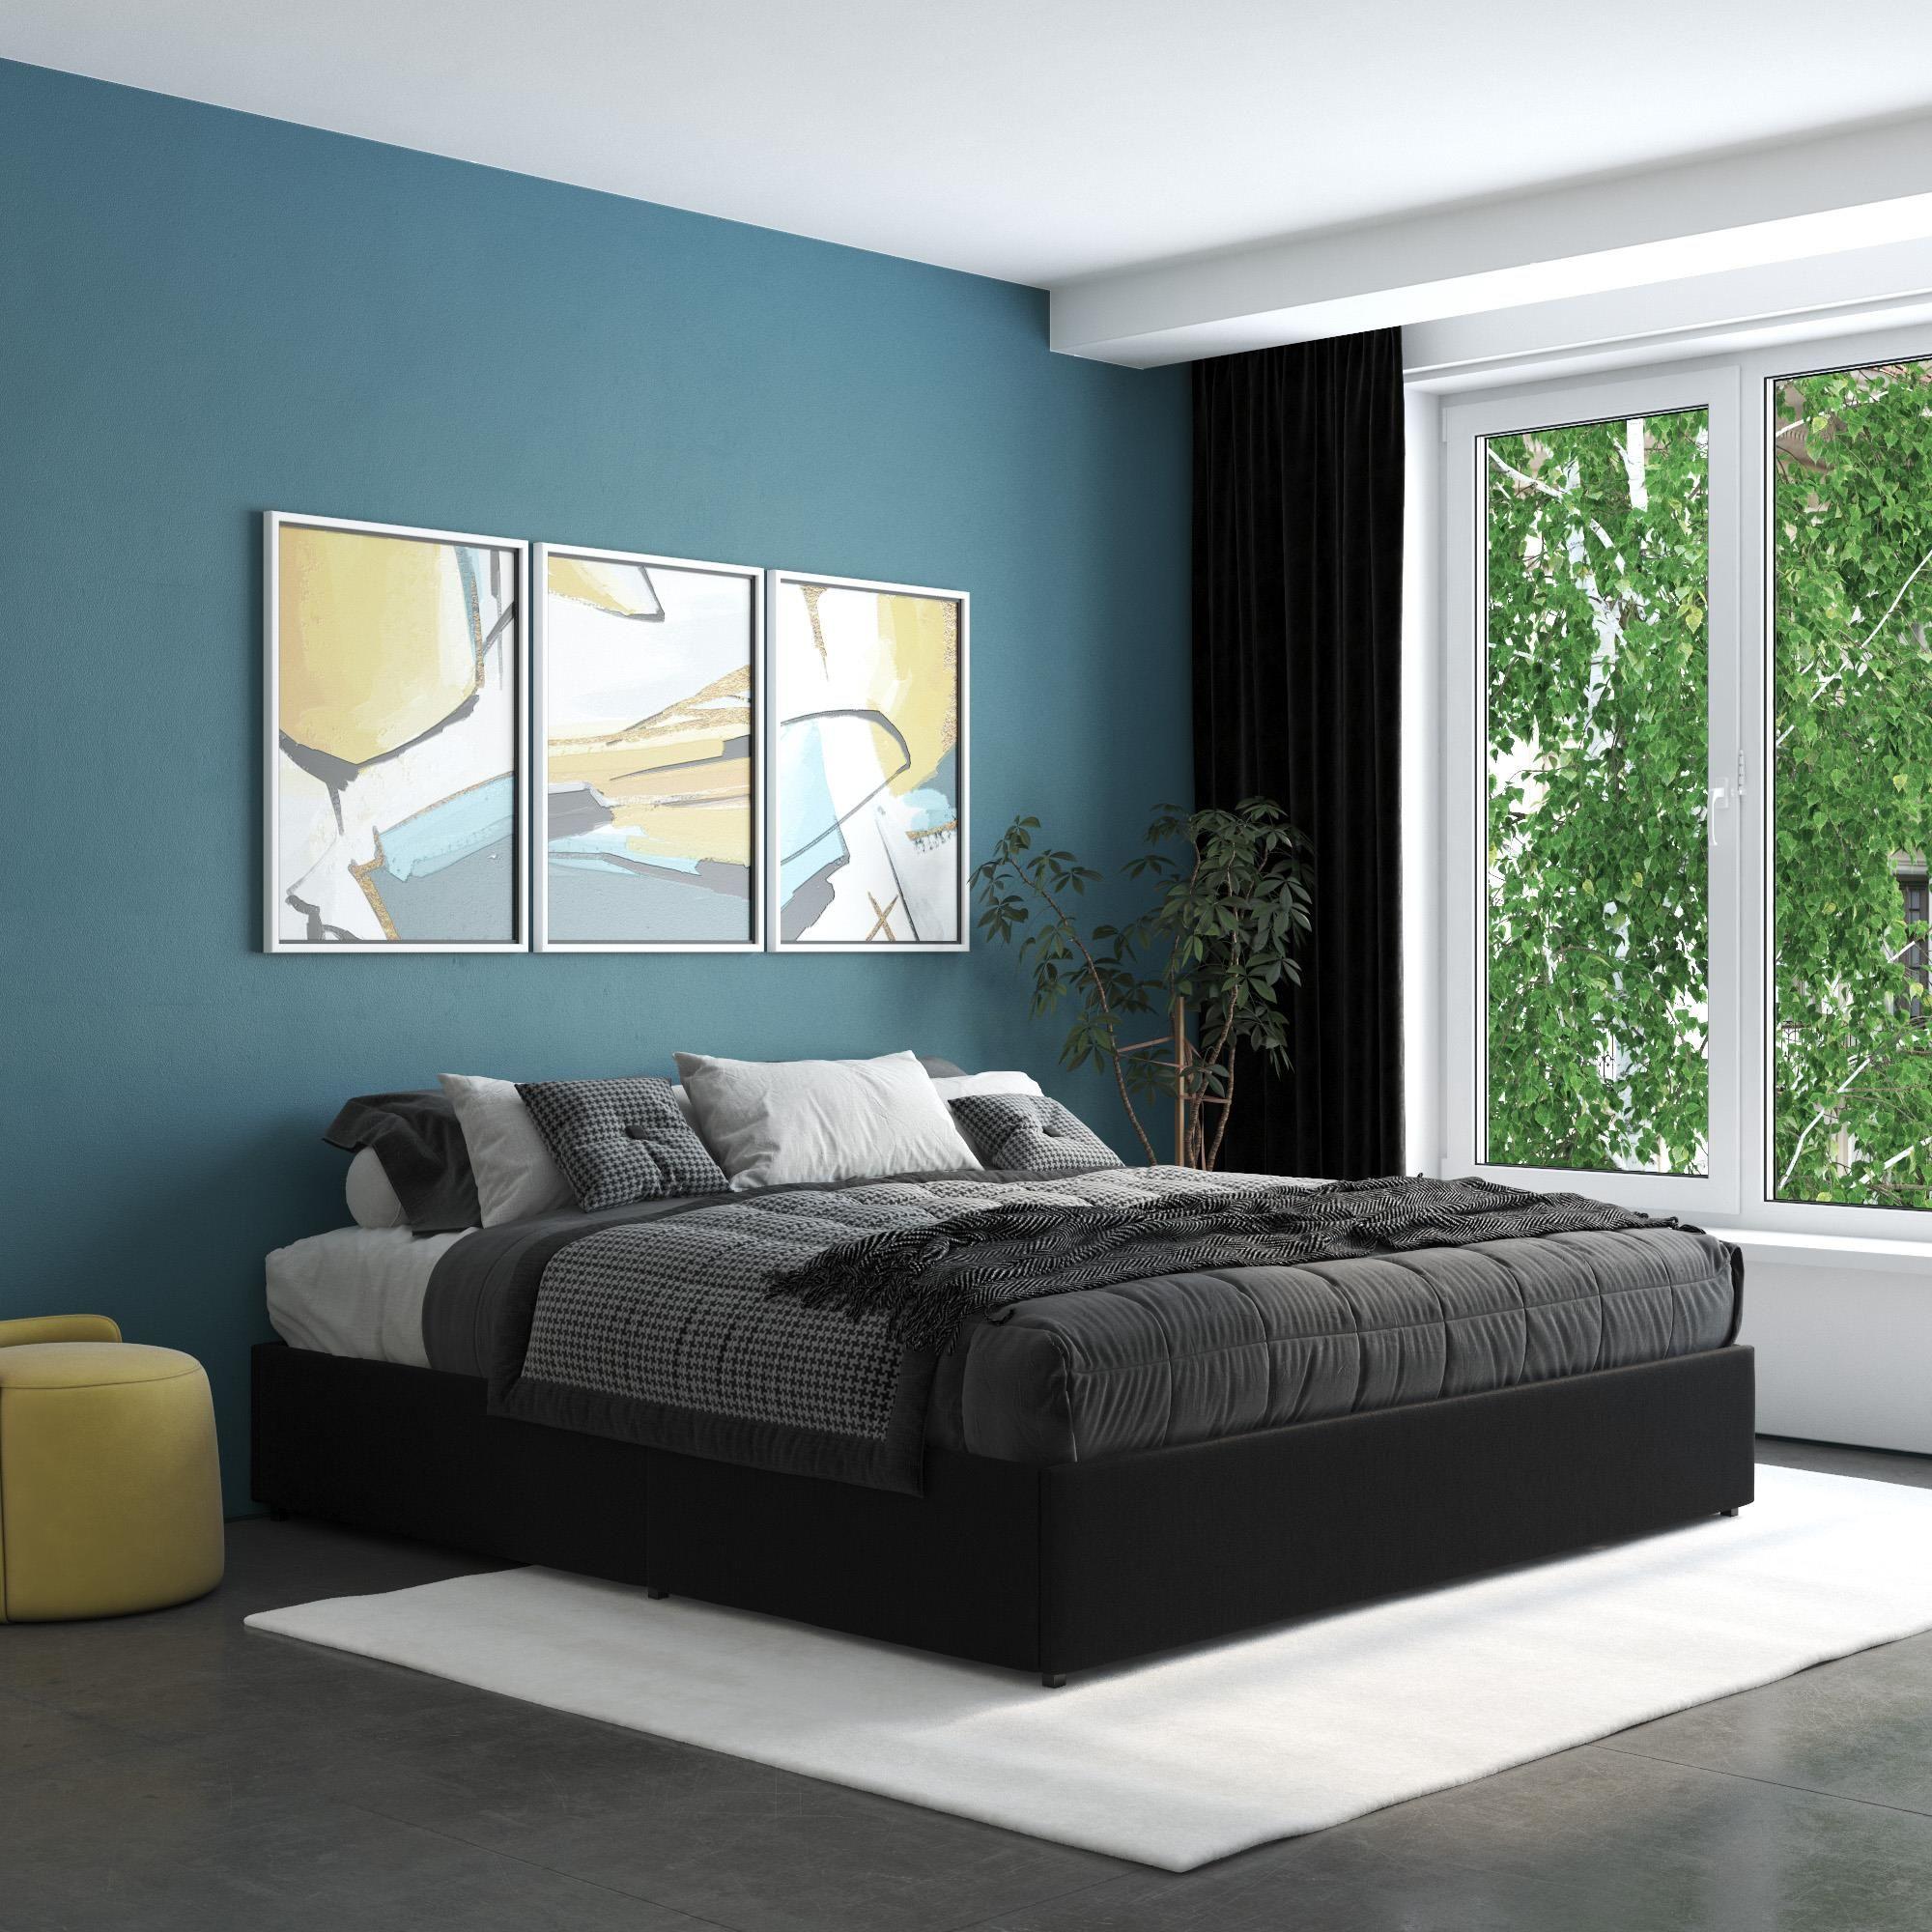 Home in 2020 Platform bed with storage, Black bedding